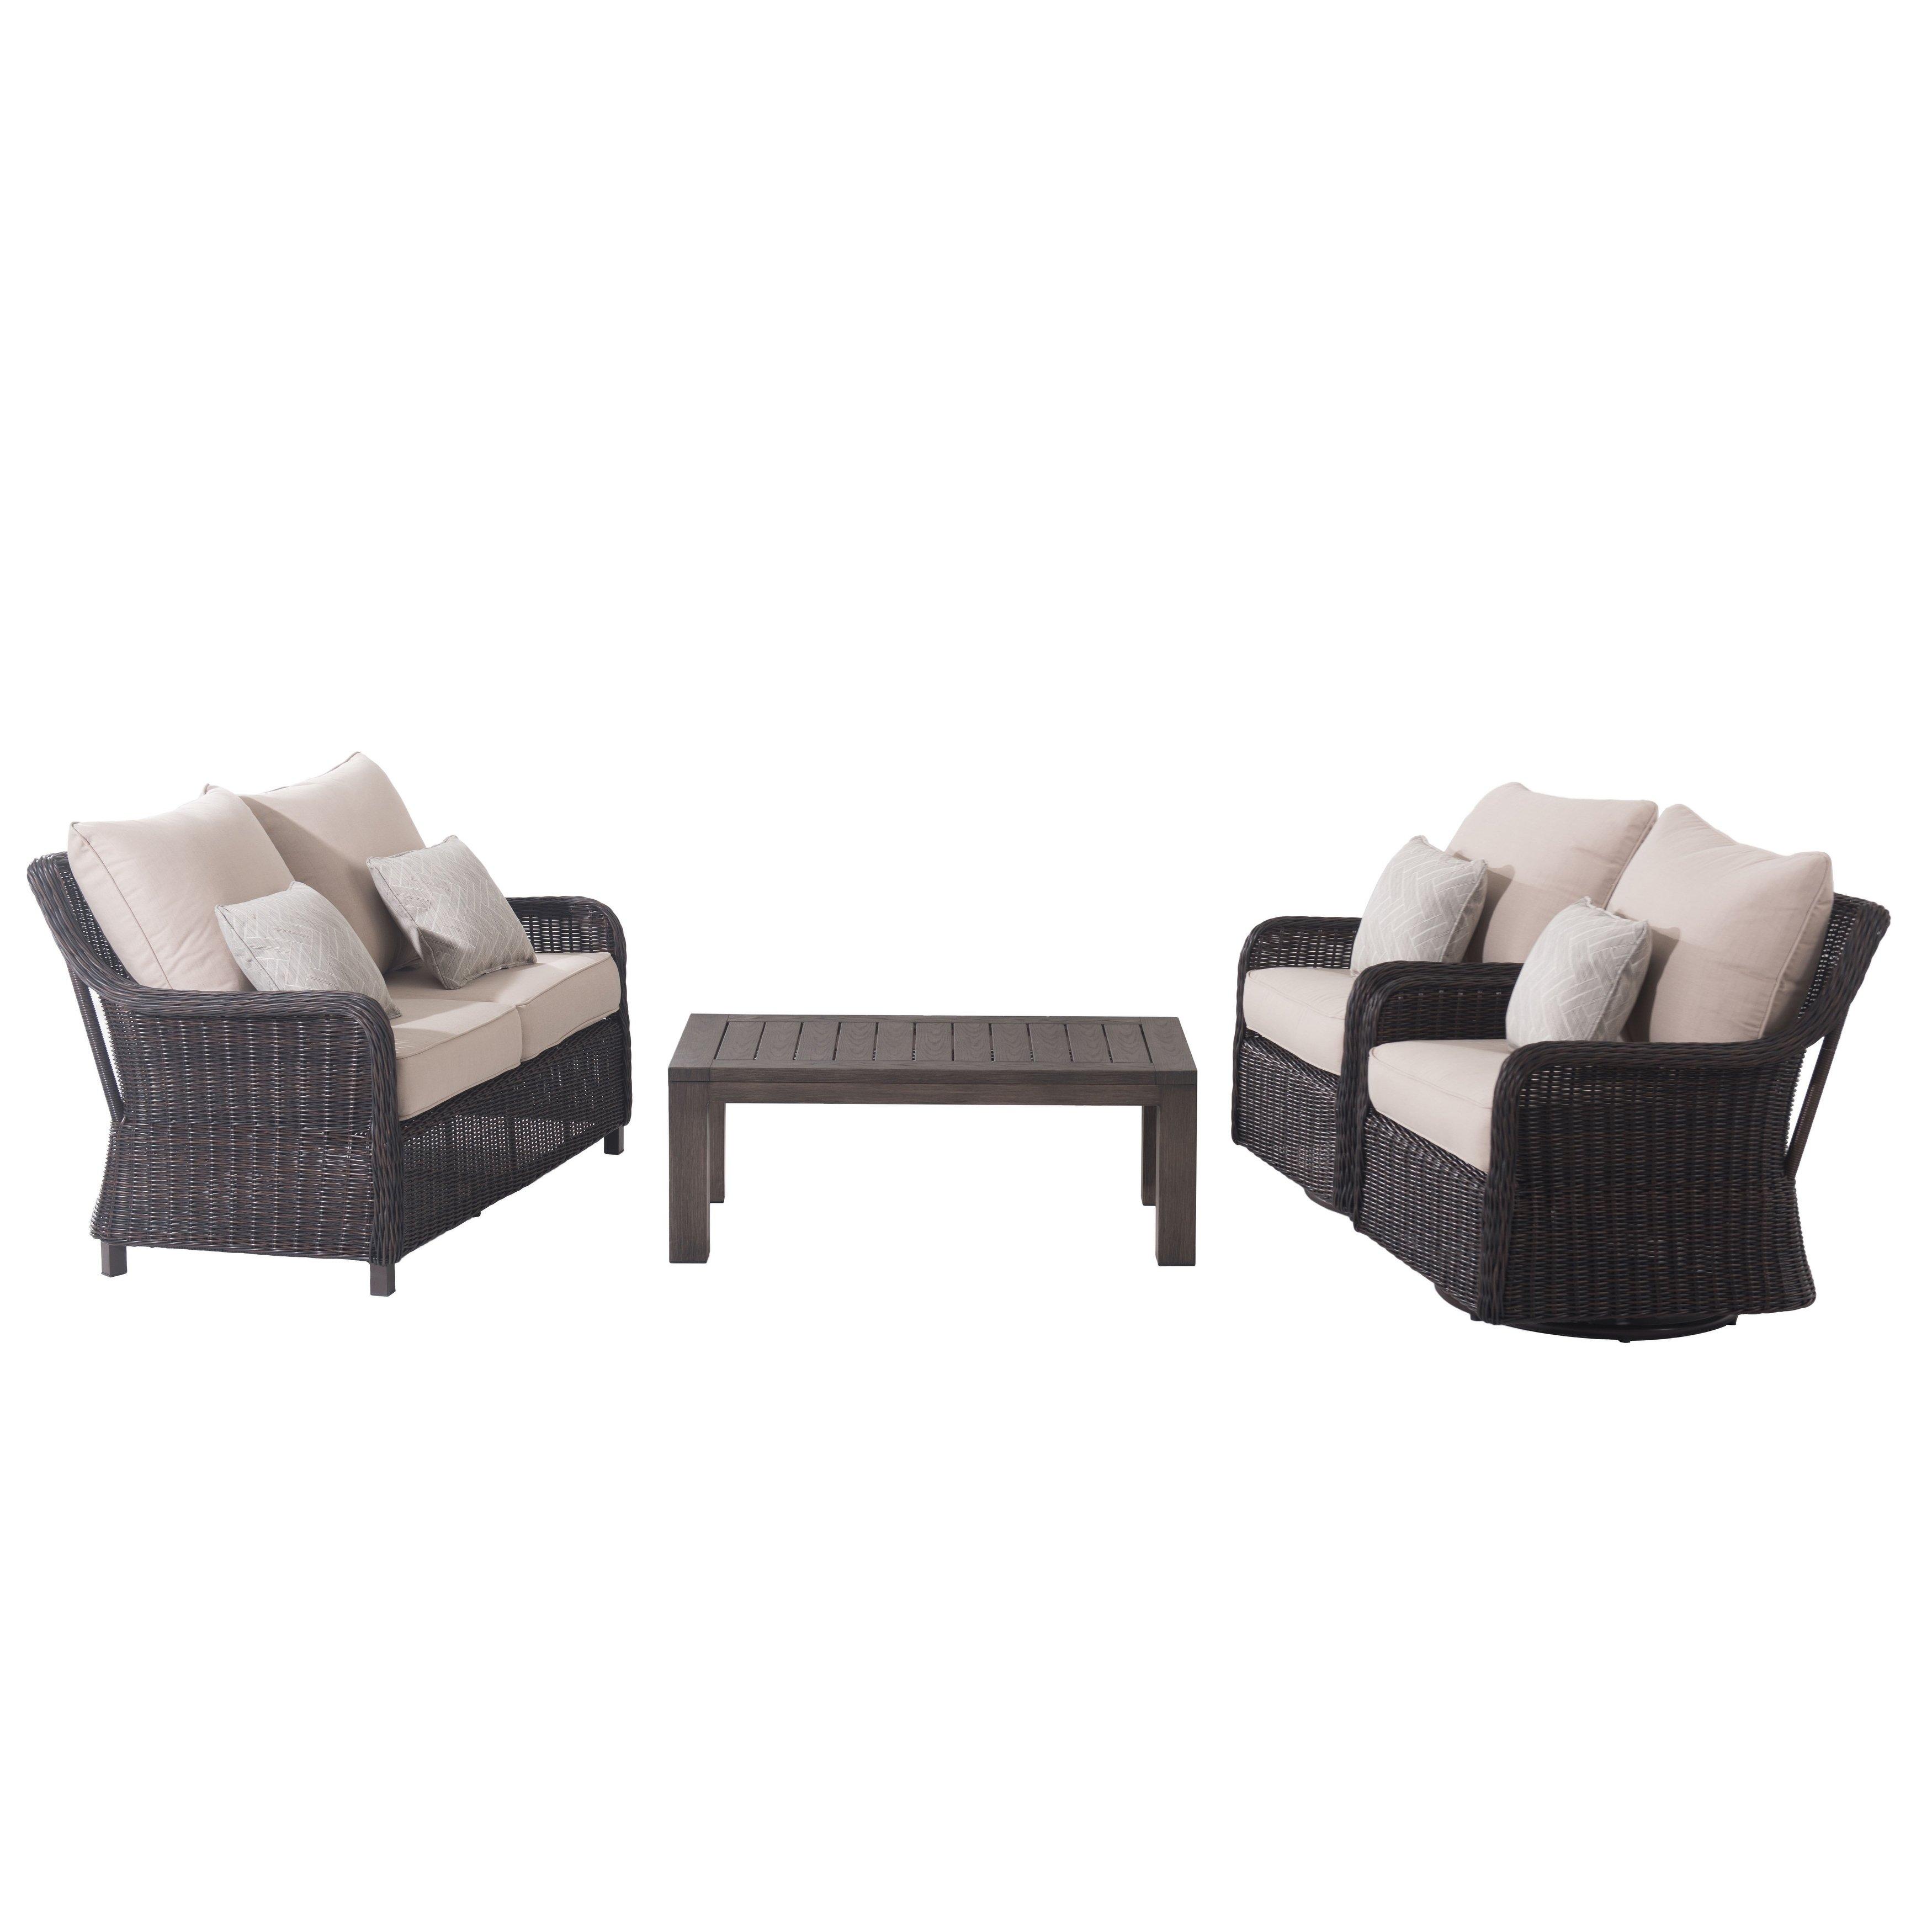 Sunjoy Dighton Outdoor 4 Piece Deep Seating Loveseat Set Beige